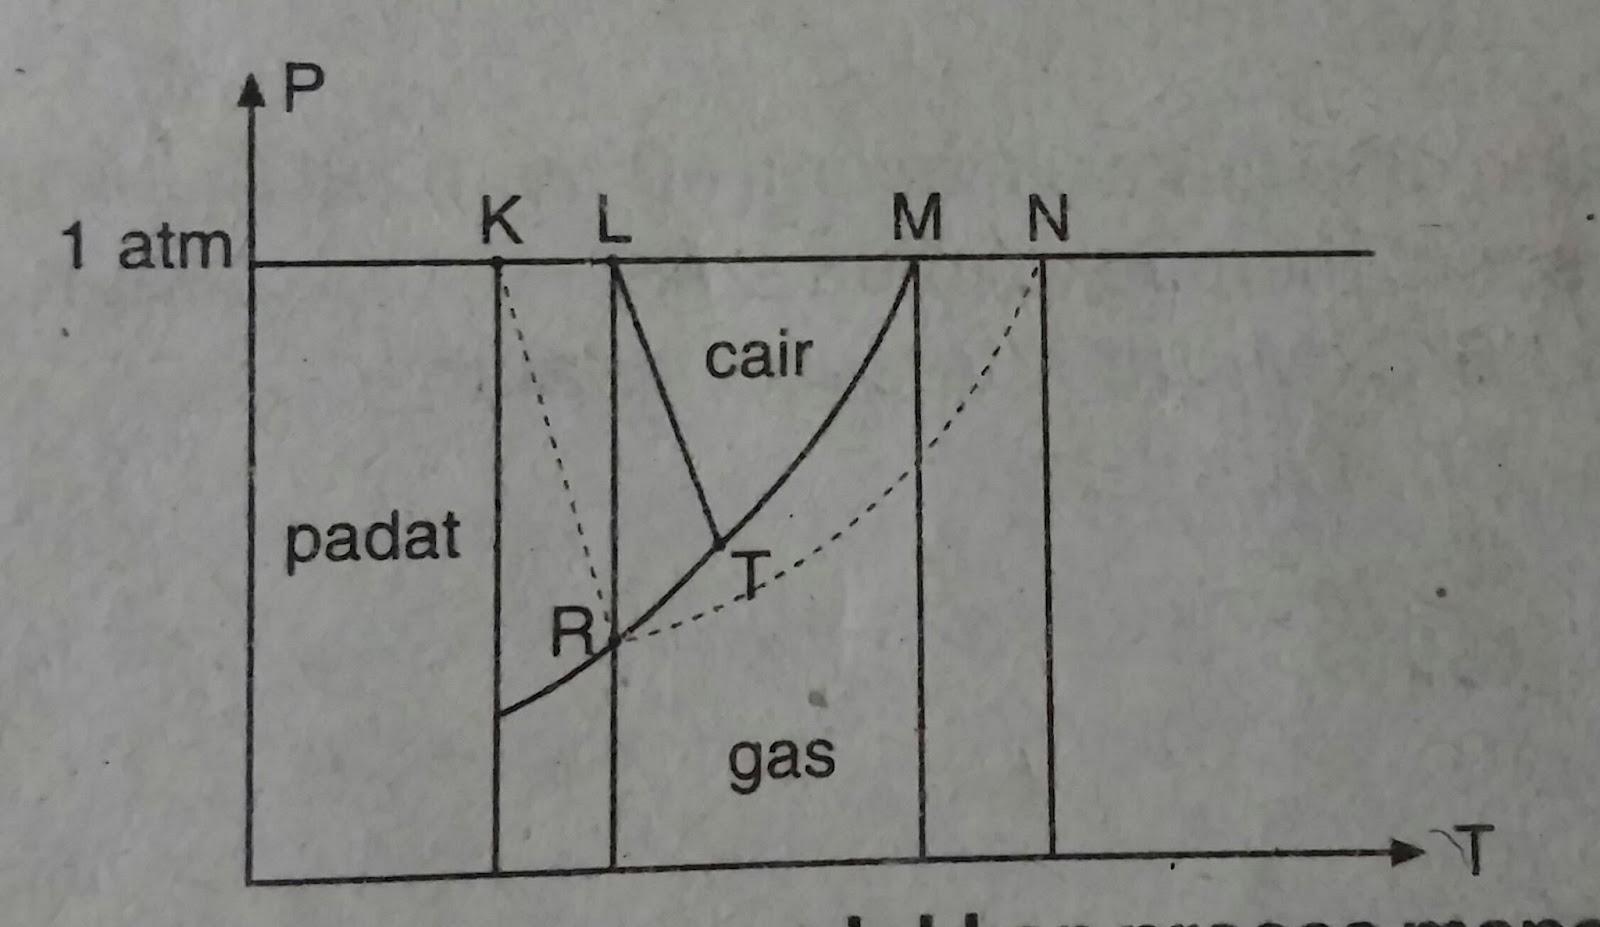 Soal kimia kelas 12 sma tentang sifat koligatif larutan your httpavkimia ccuart Choice Image